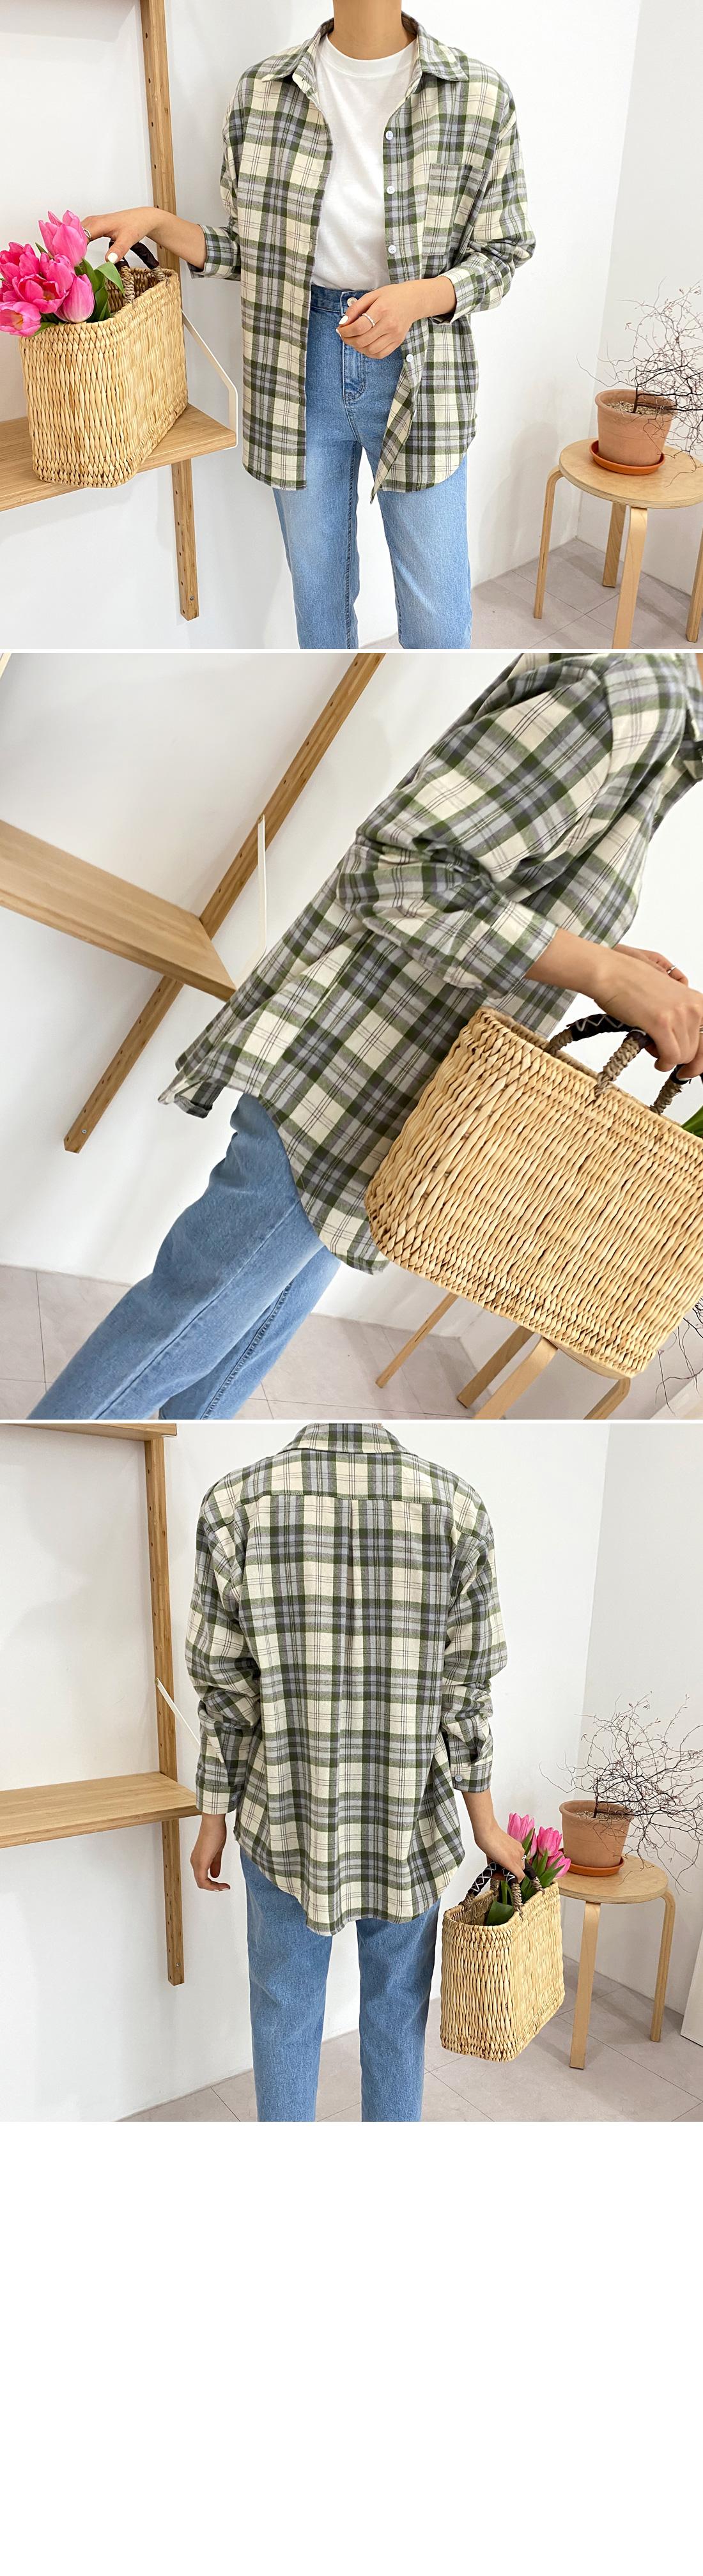 Roy check shirt